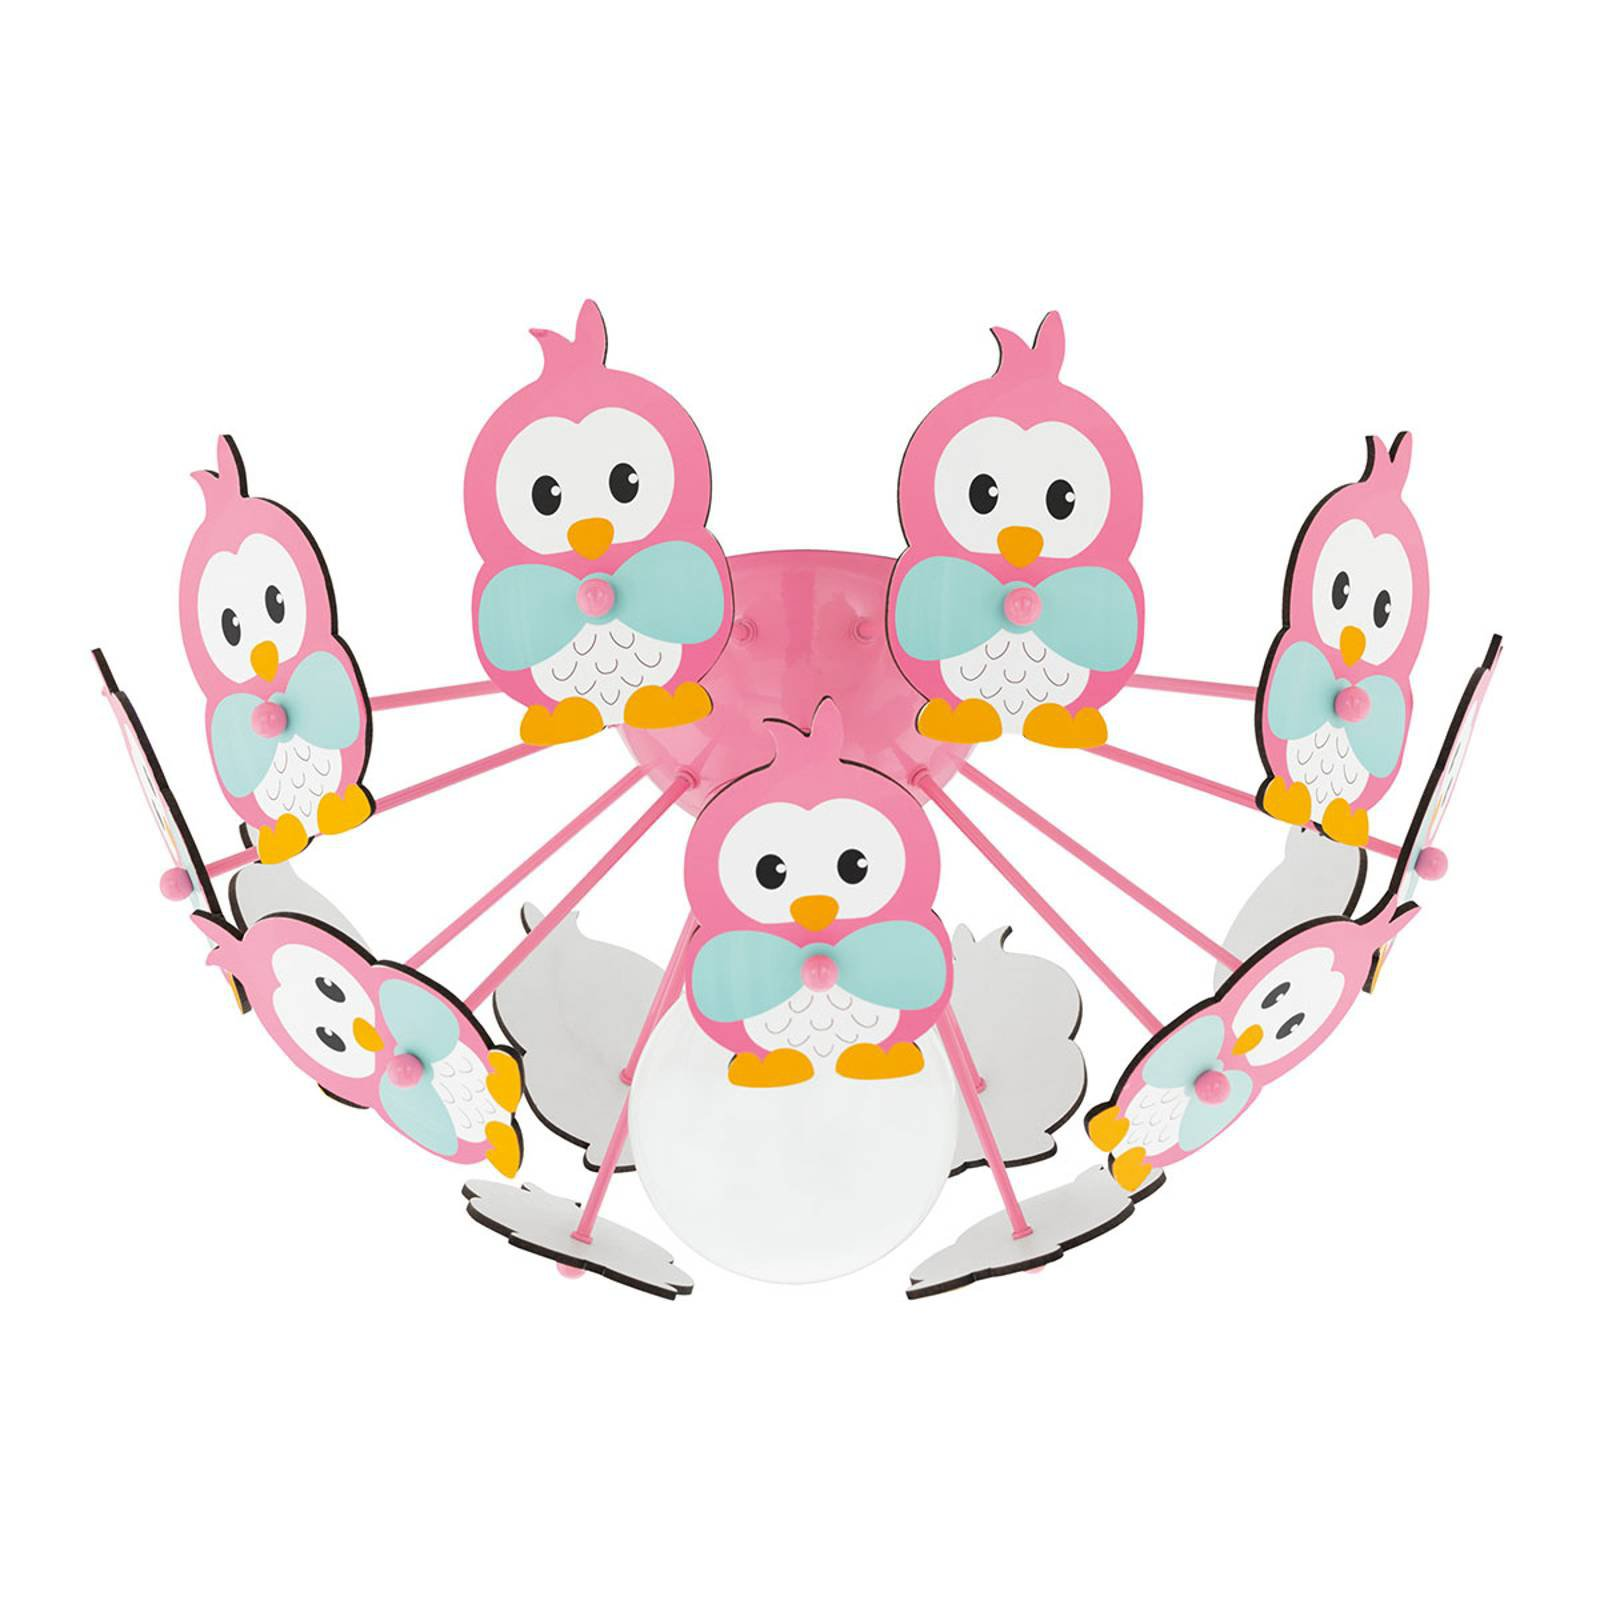 Taklampe Viki 2 med pingviner rosa